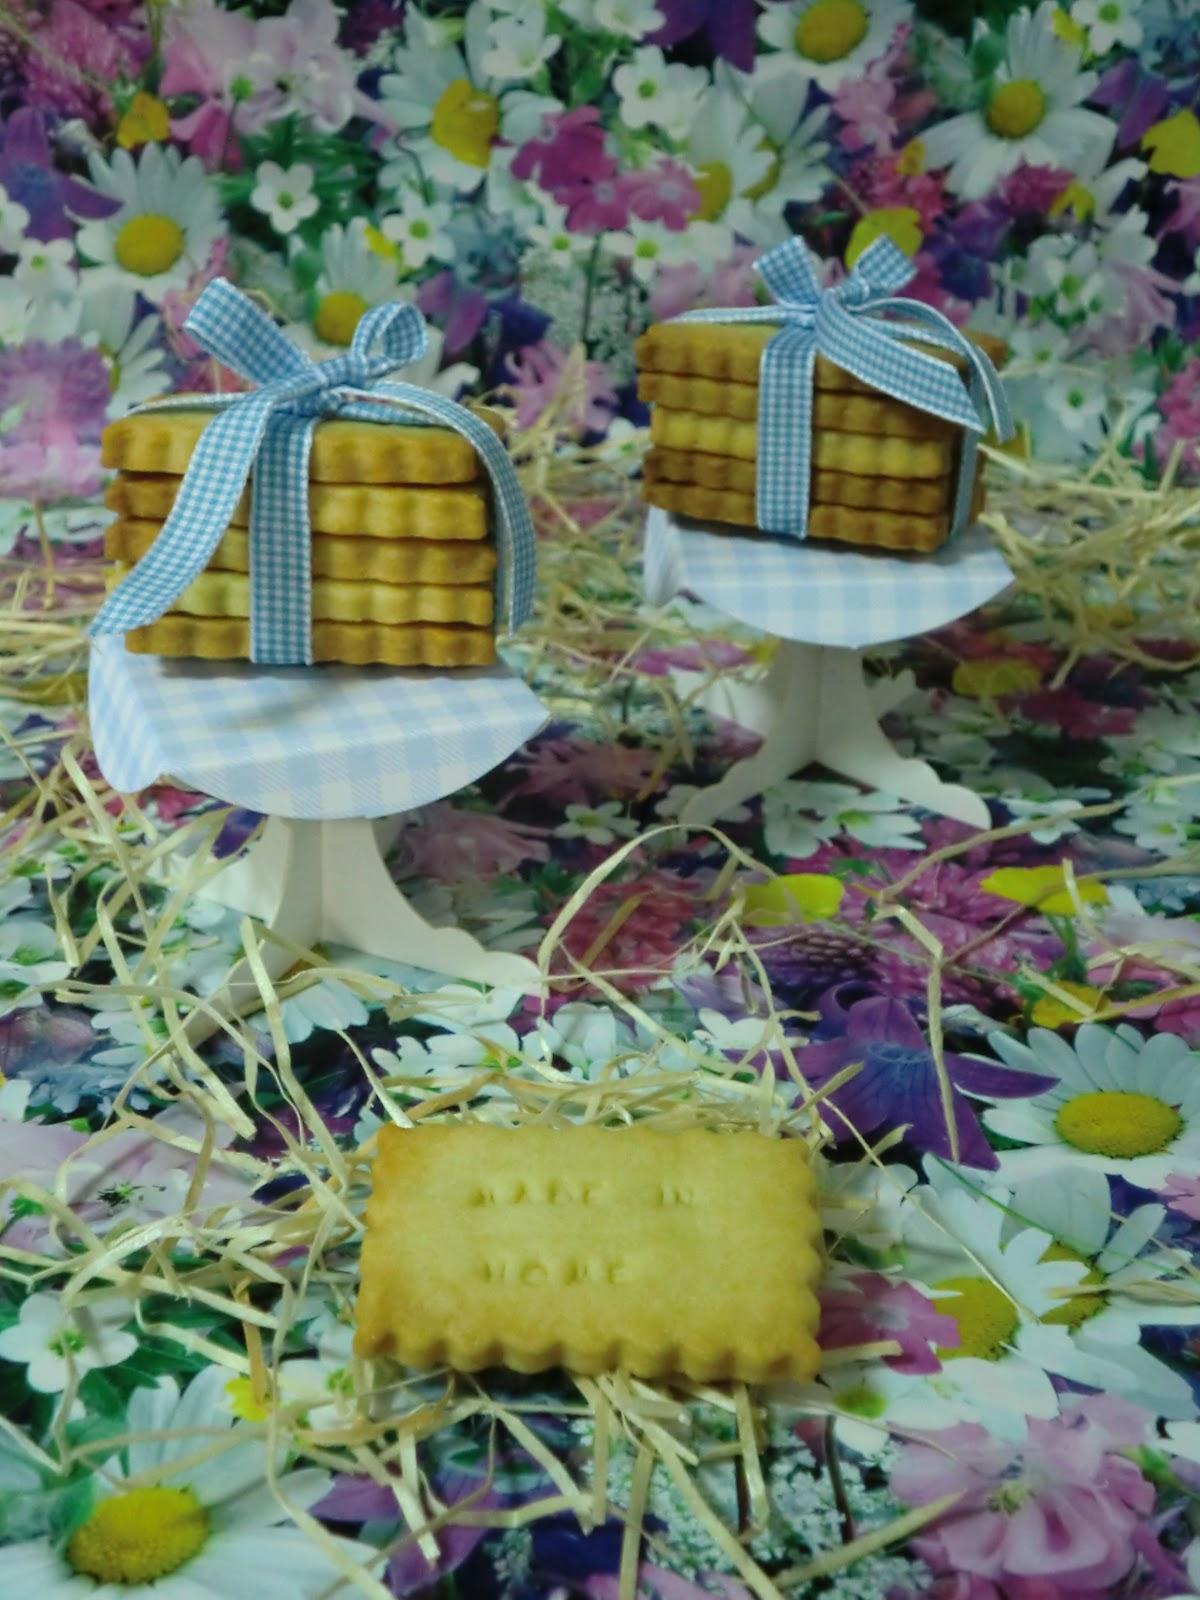 Bundt Cake Lk Mary